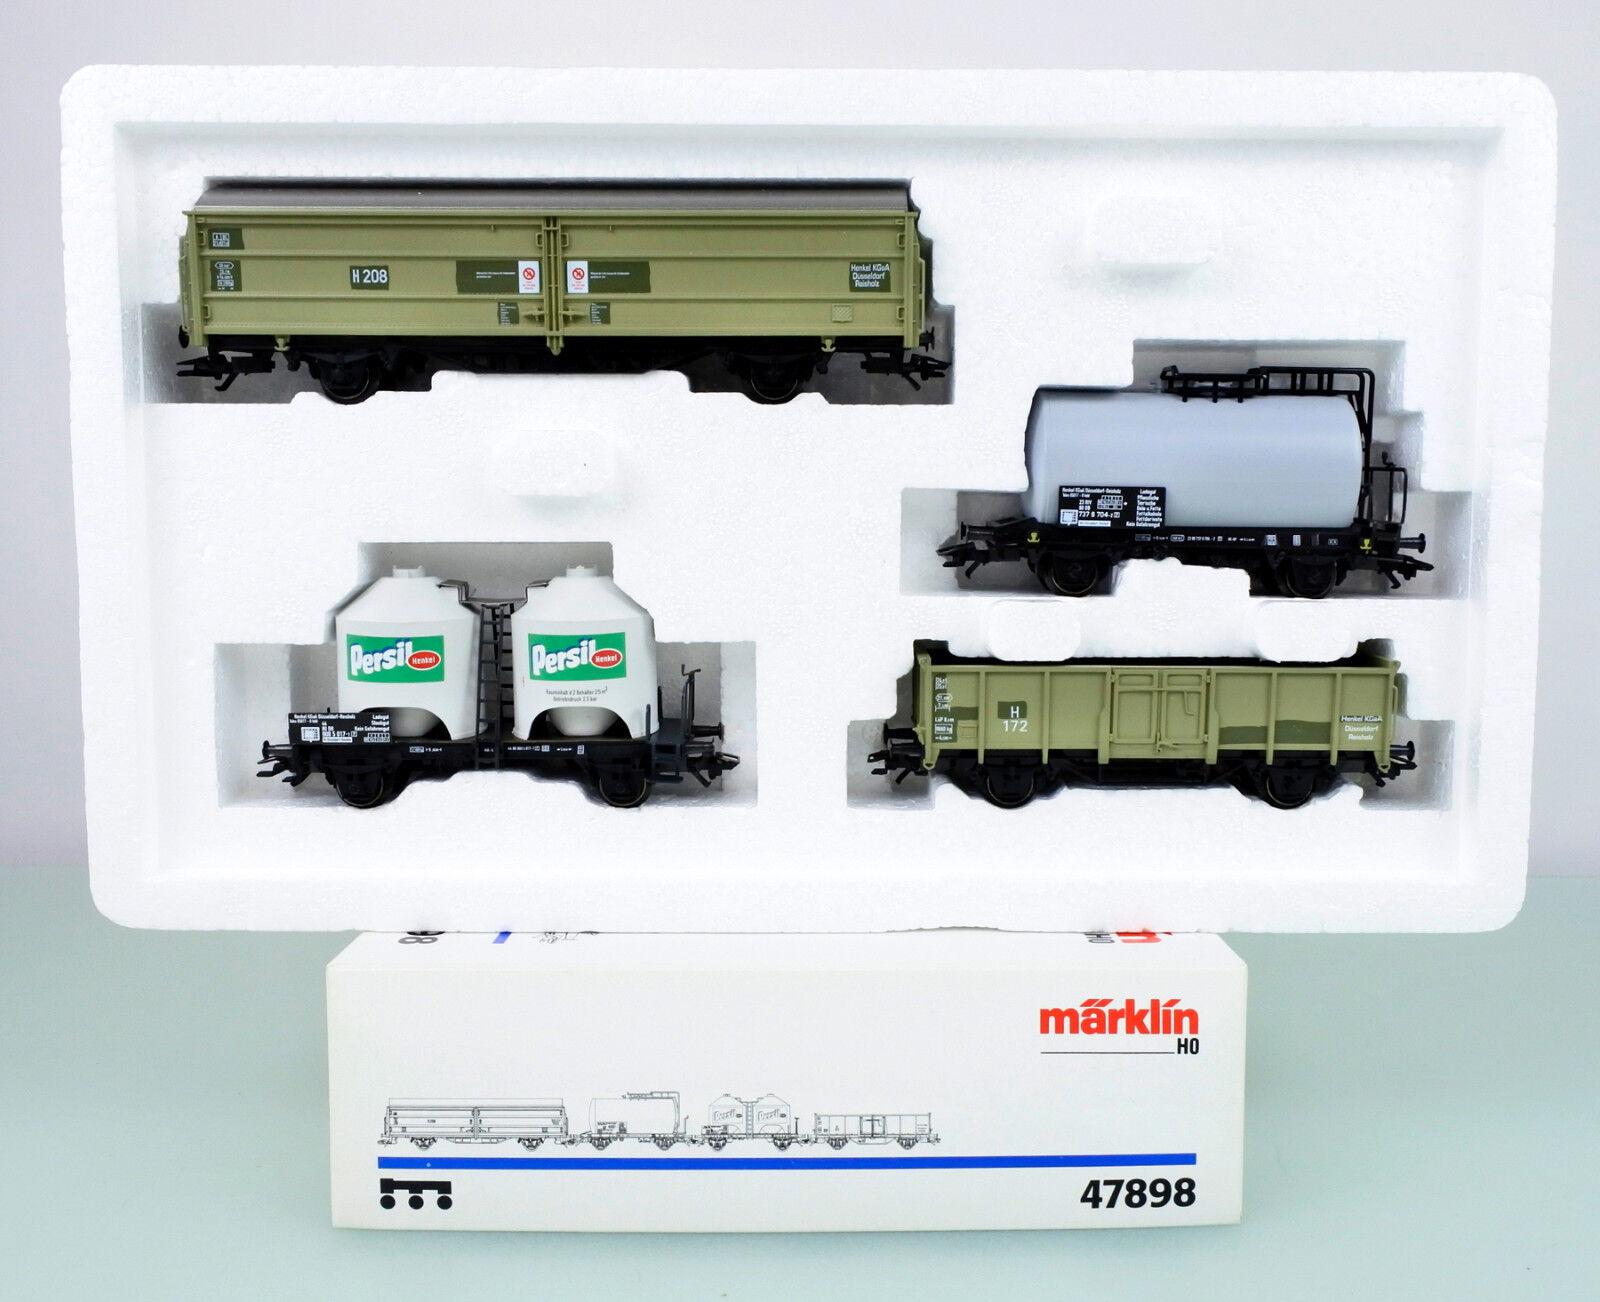 Marklin HO Scale 47898  Henkel  4 Conjunto De Coche de carga